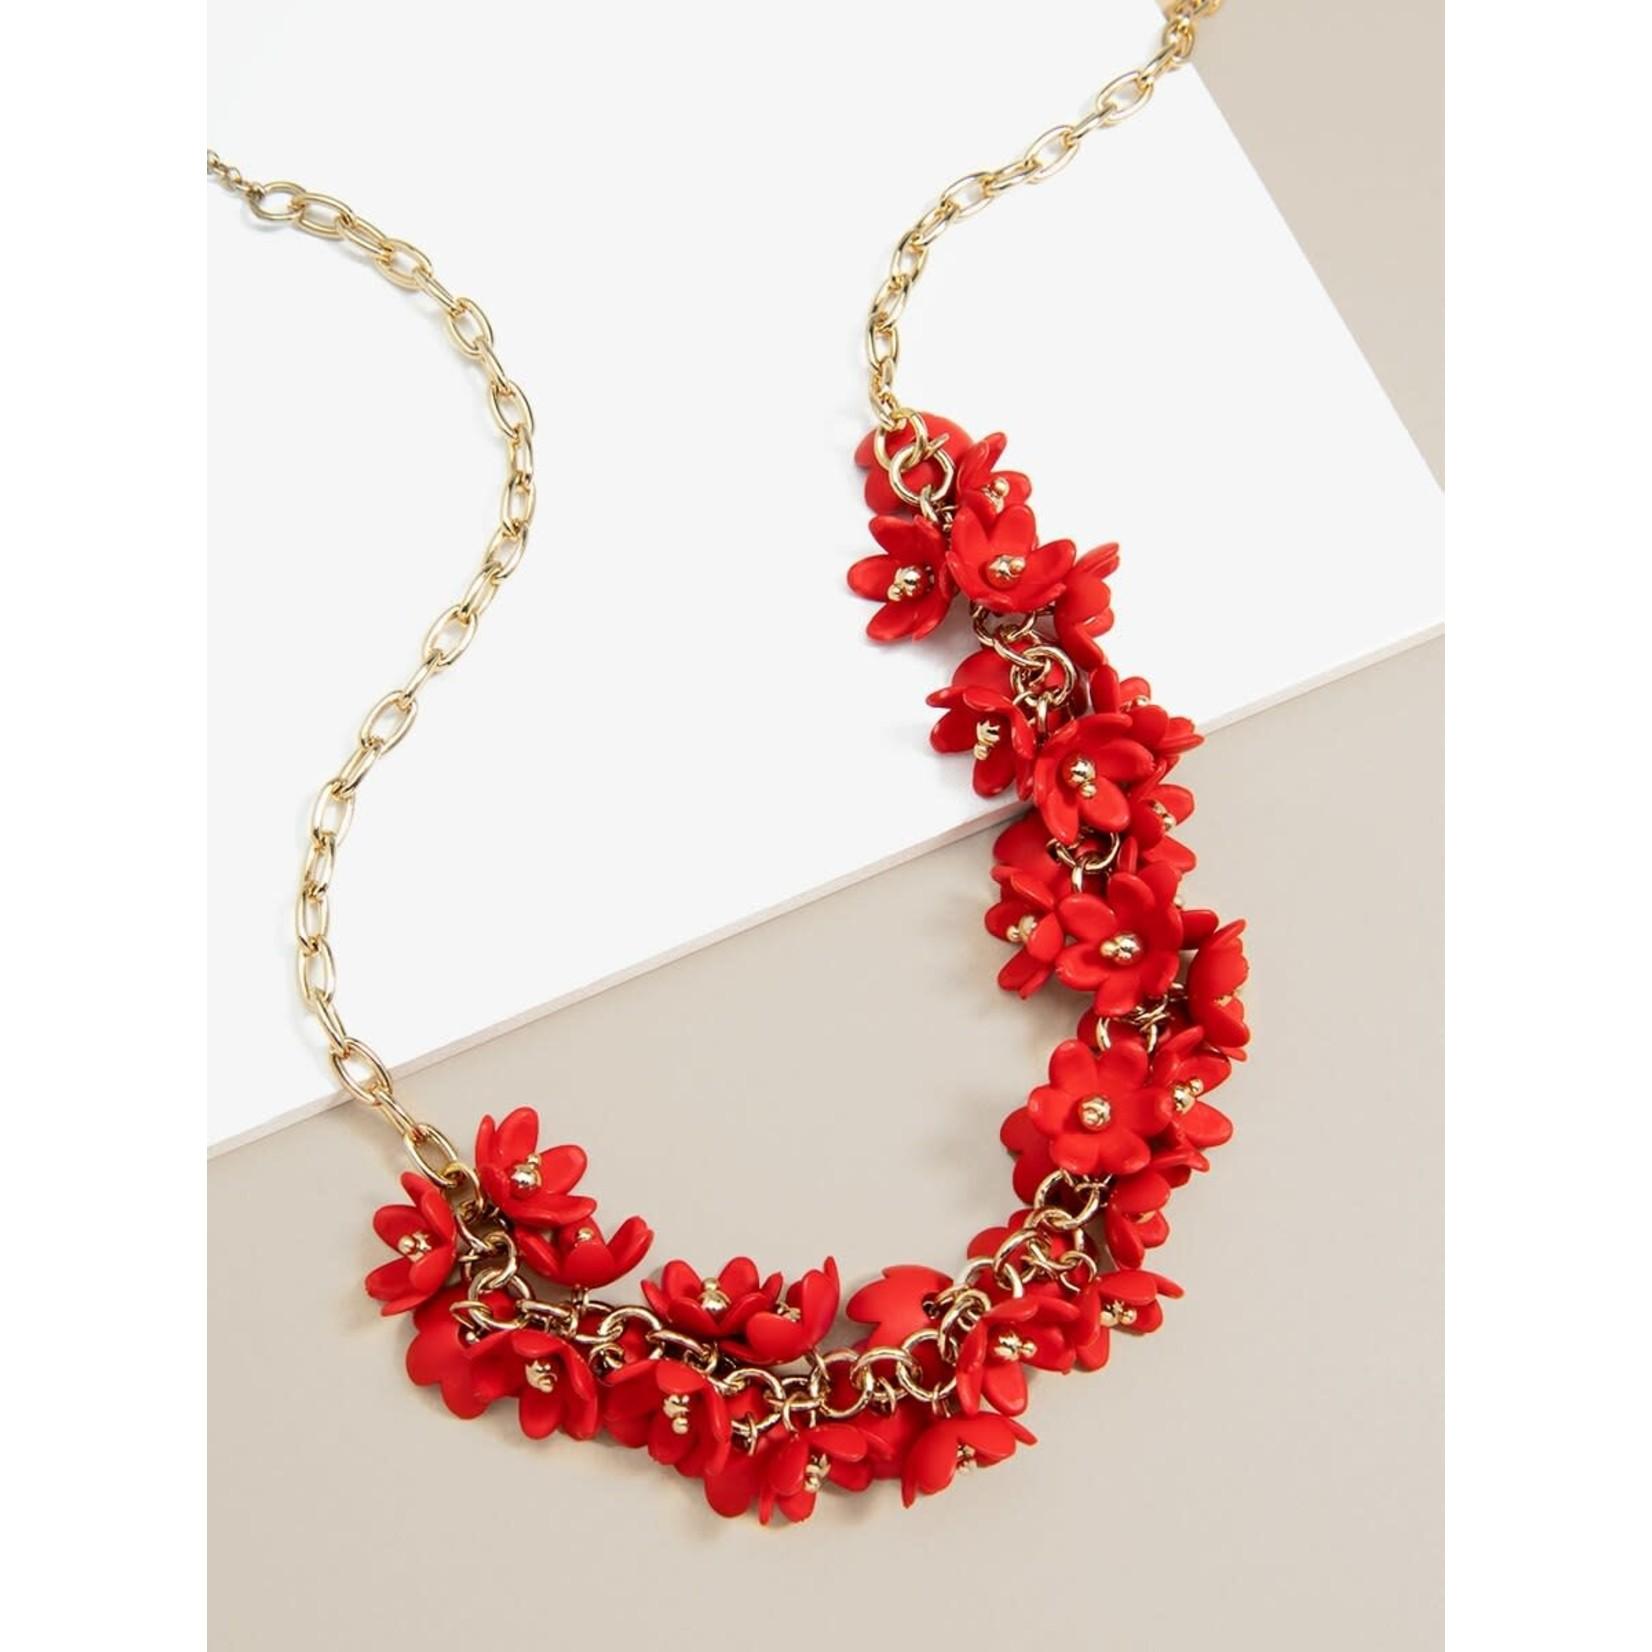 Petite Petals Collar Necklace in Flame